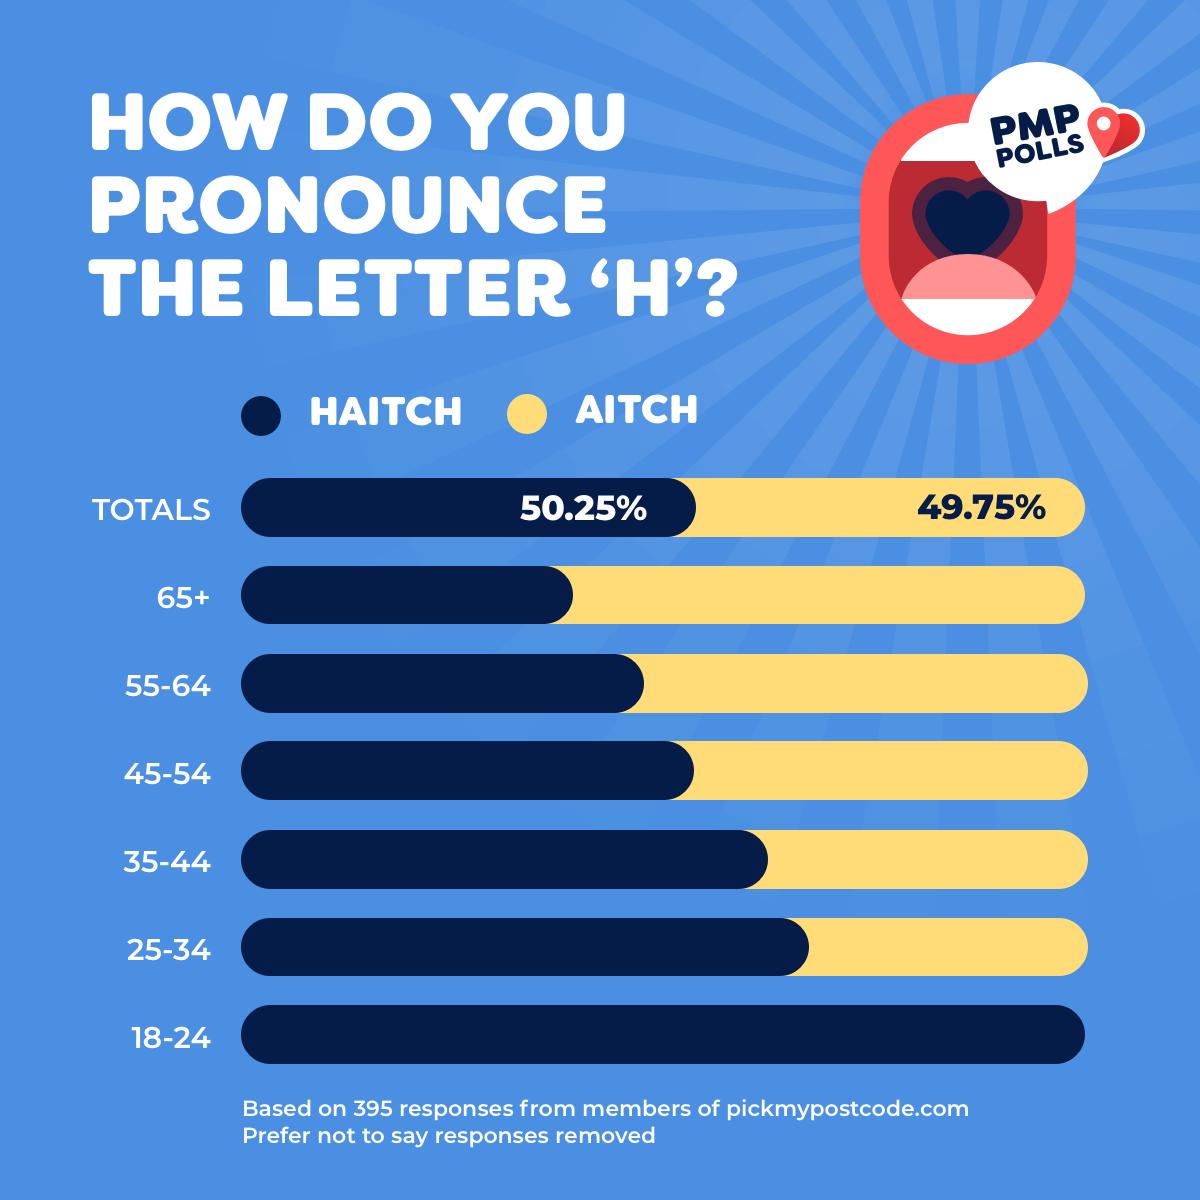 How do you pronounce the letter 'H'? 'Haitch': 50.25%. 'Aitch': 49.75%.